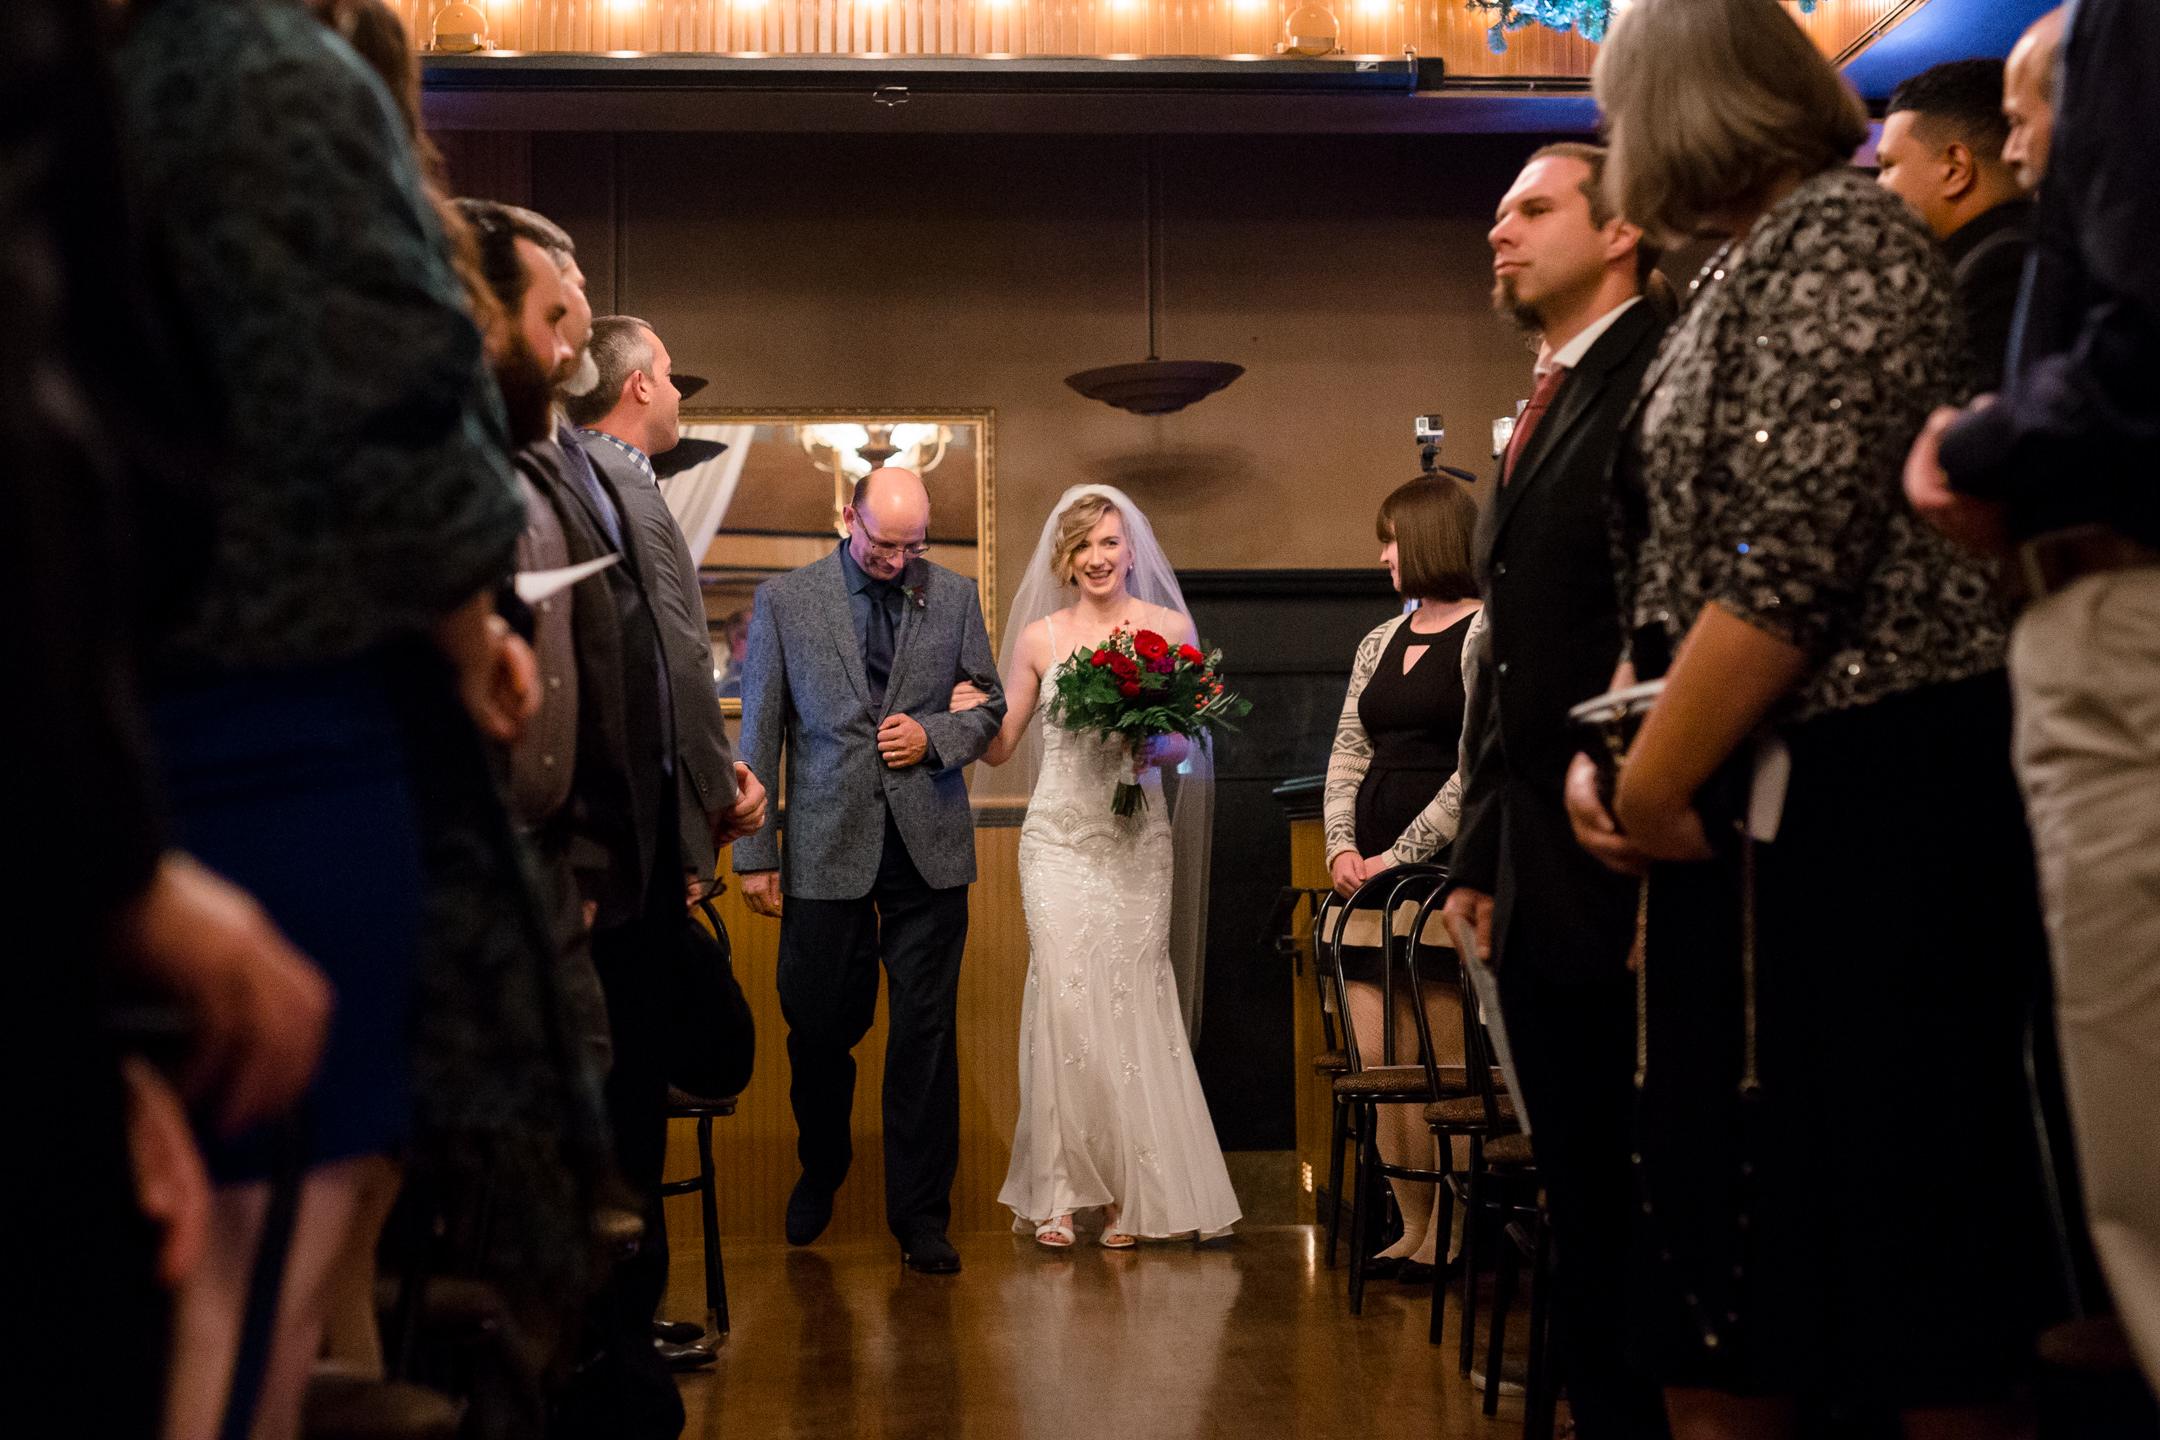 Documentary-Wedding-Photography-Andrew-Tat-Gabi & Kim-12.jpg